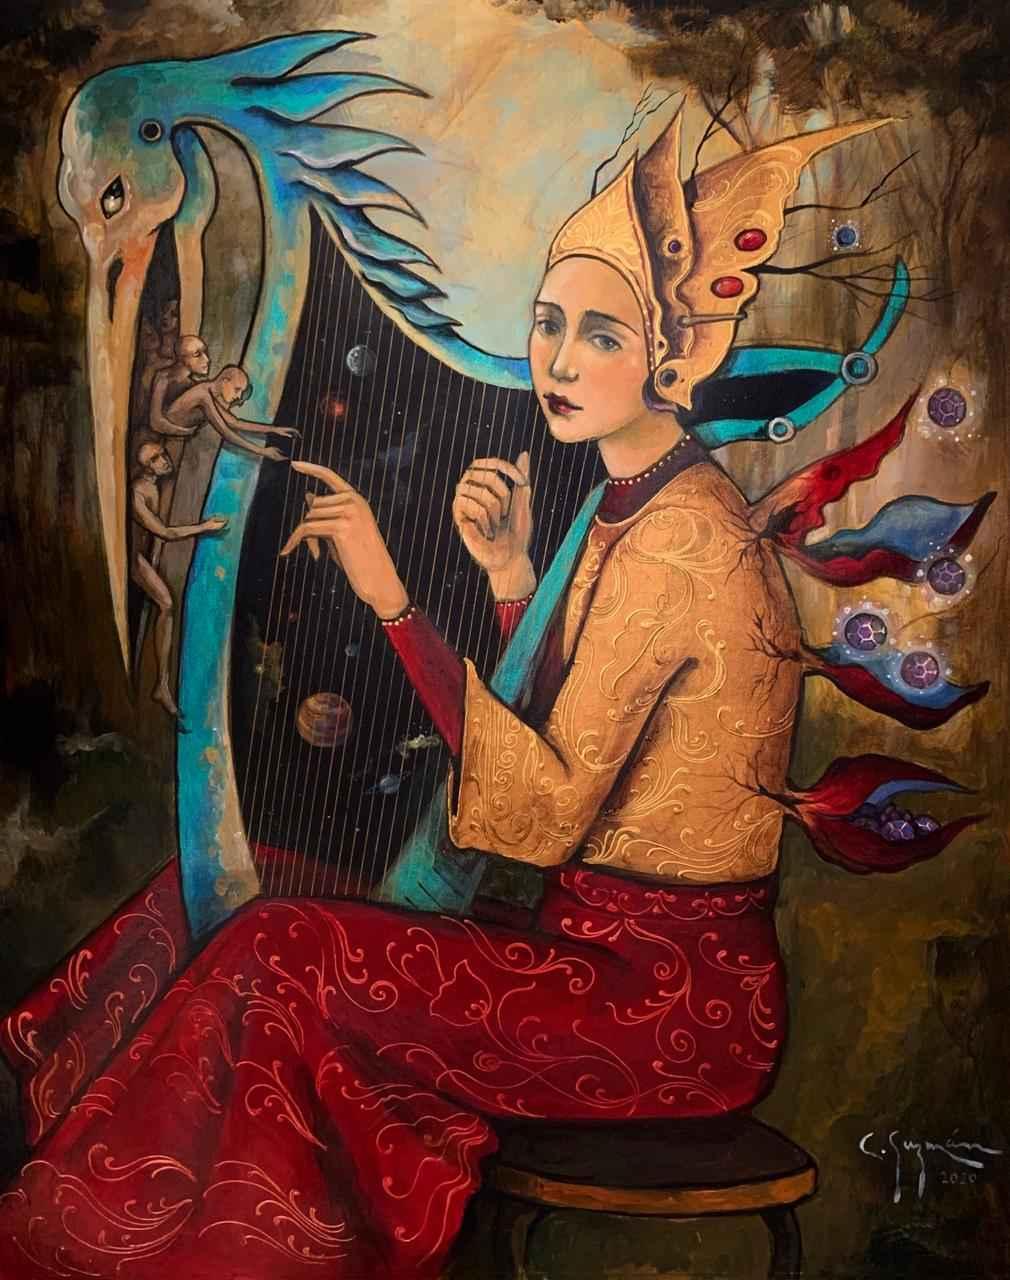 Obra: La música del universo